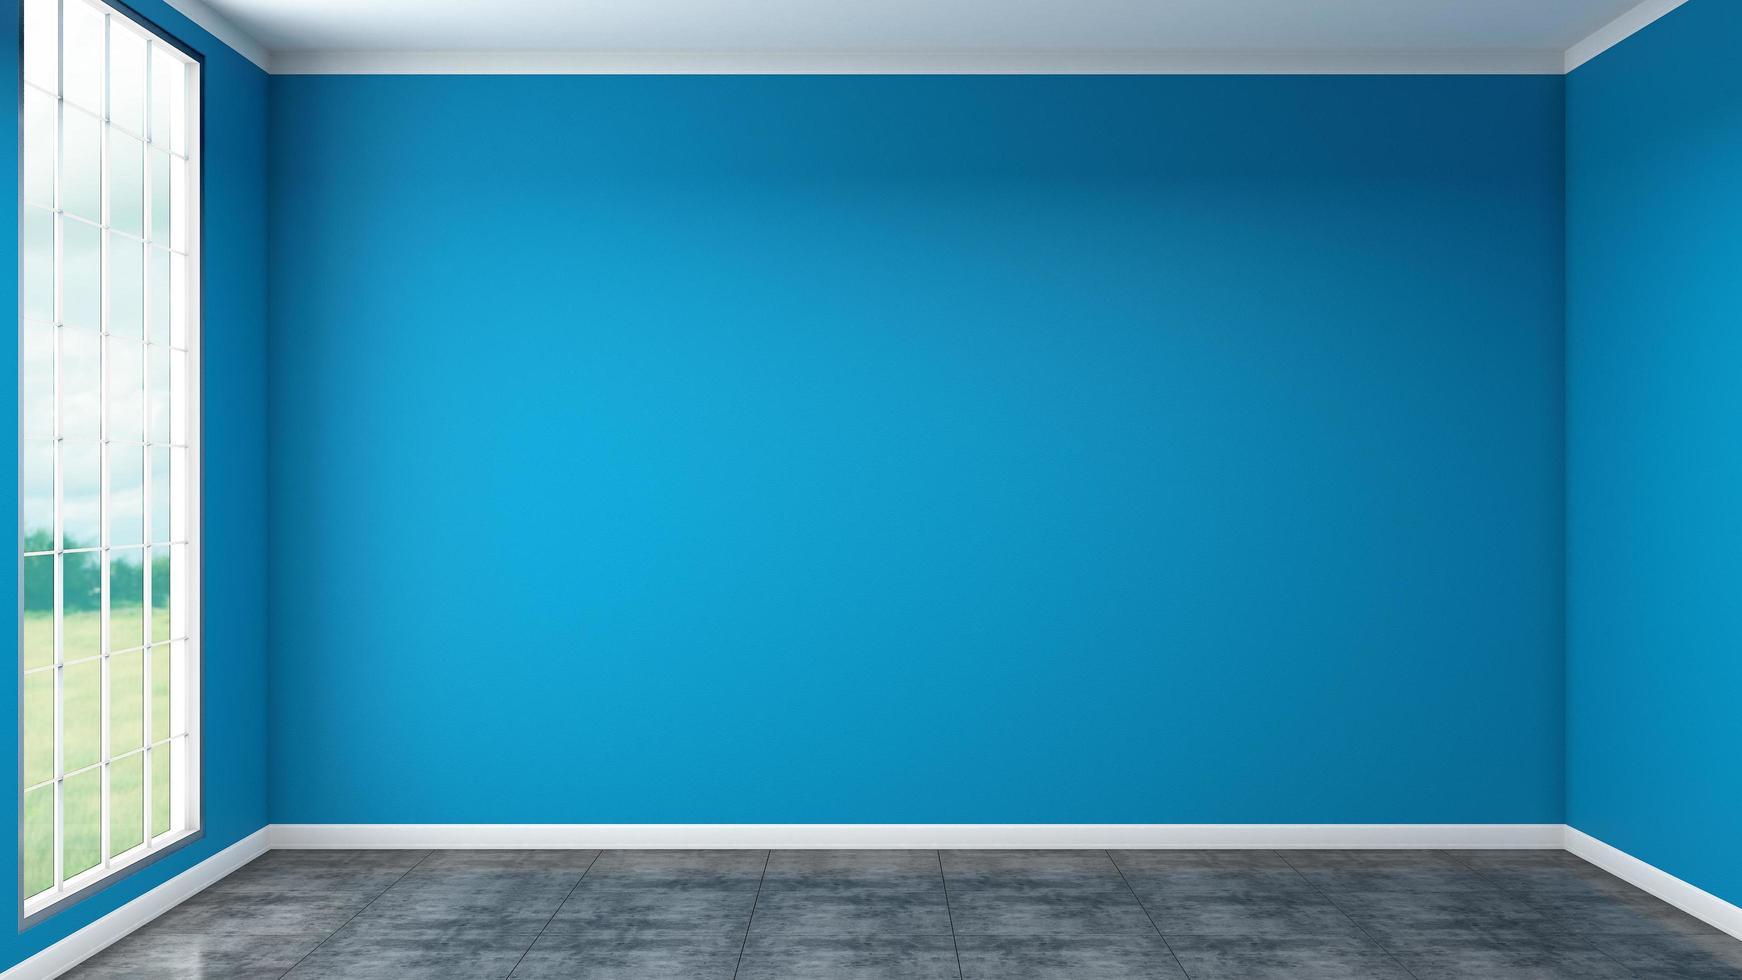 sala de estar azul moderna vacía foto